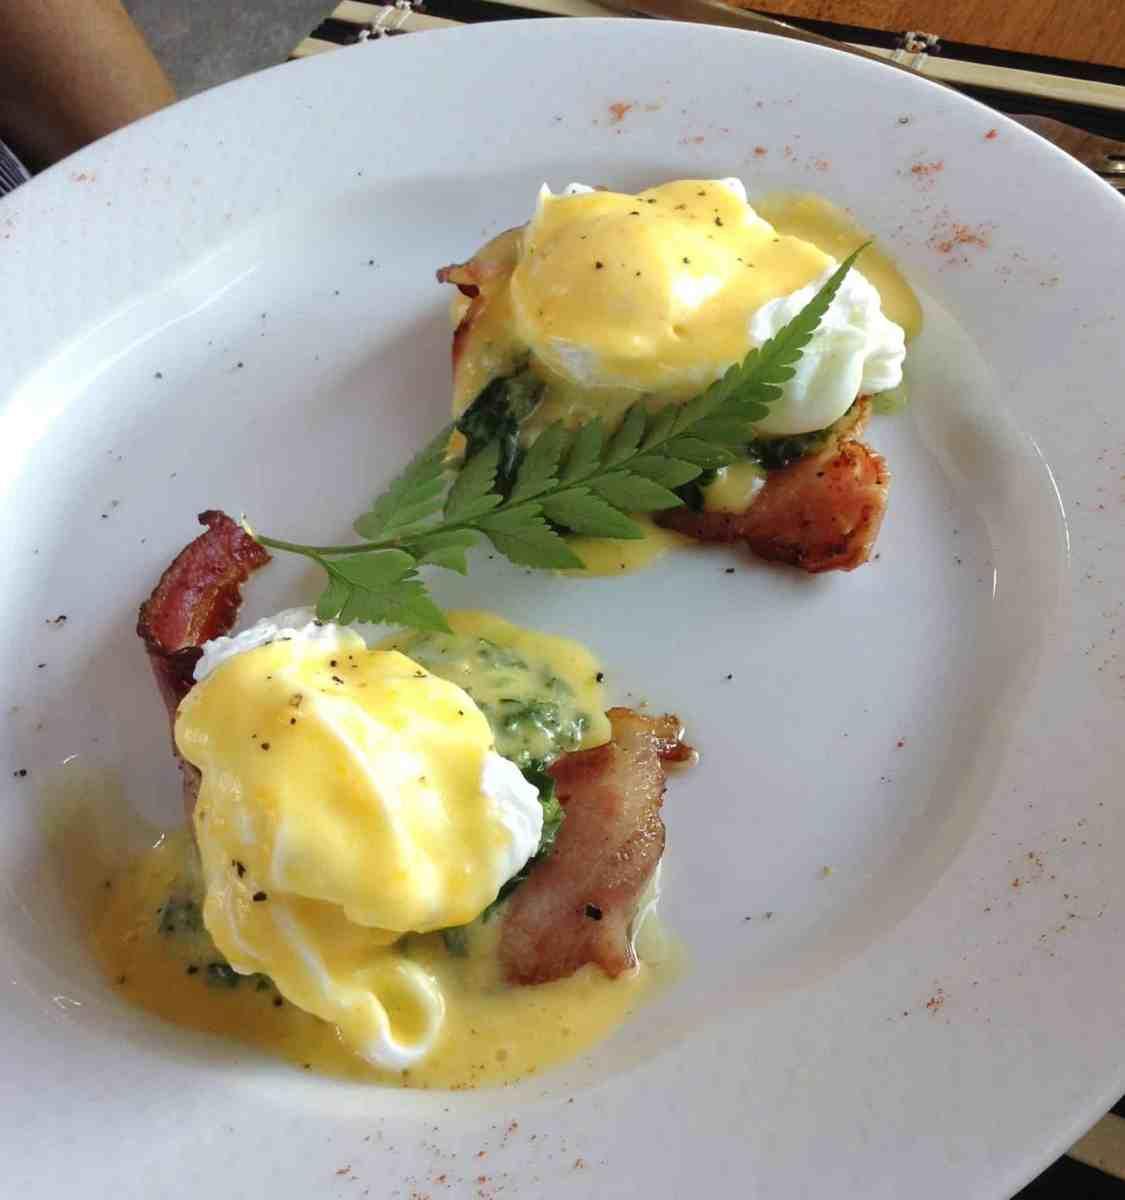 how to eat egg bodybuilding